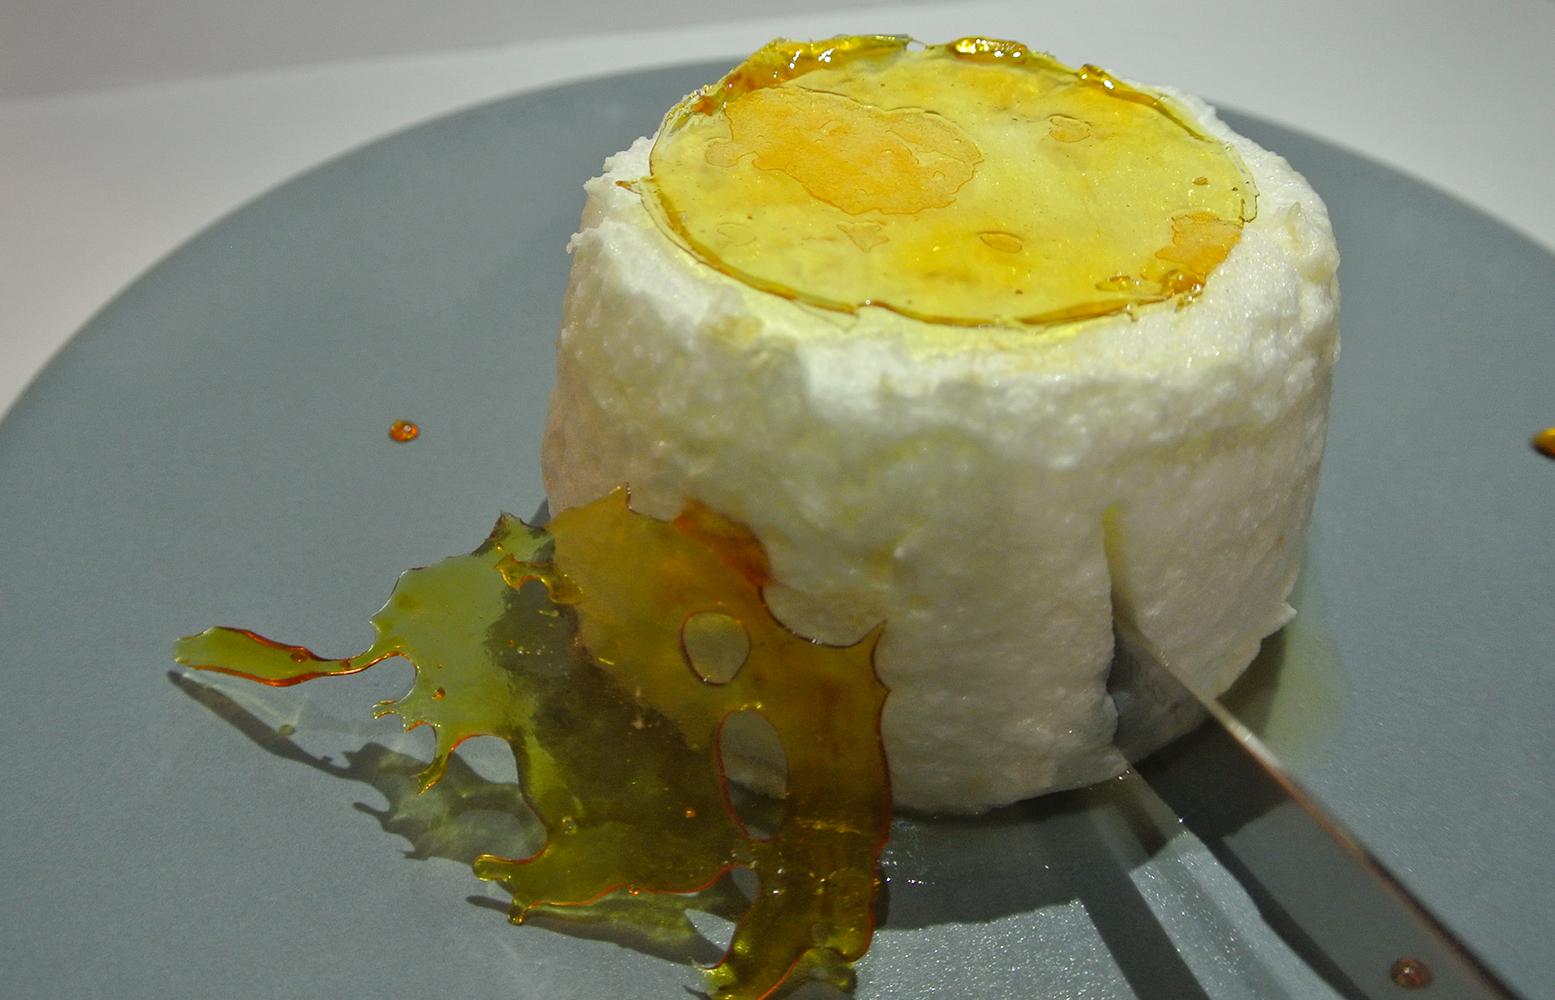 blanc-manger-chef-piège-3